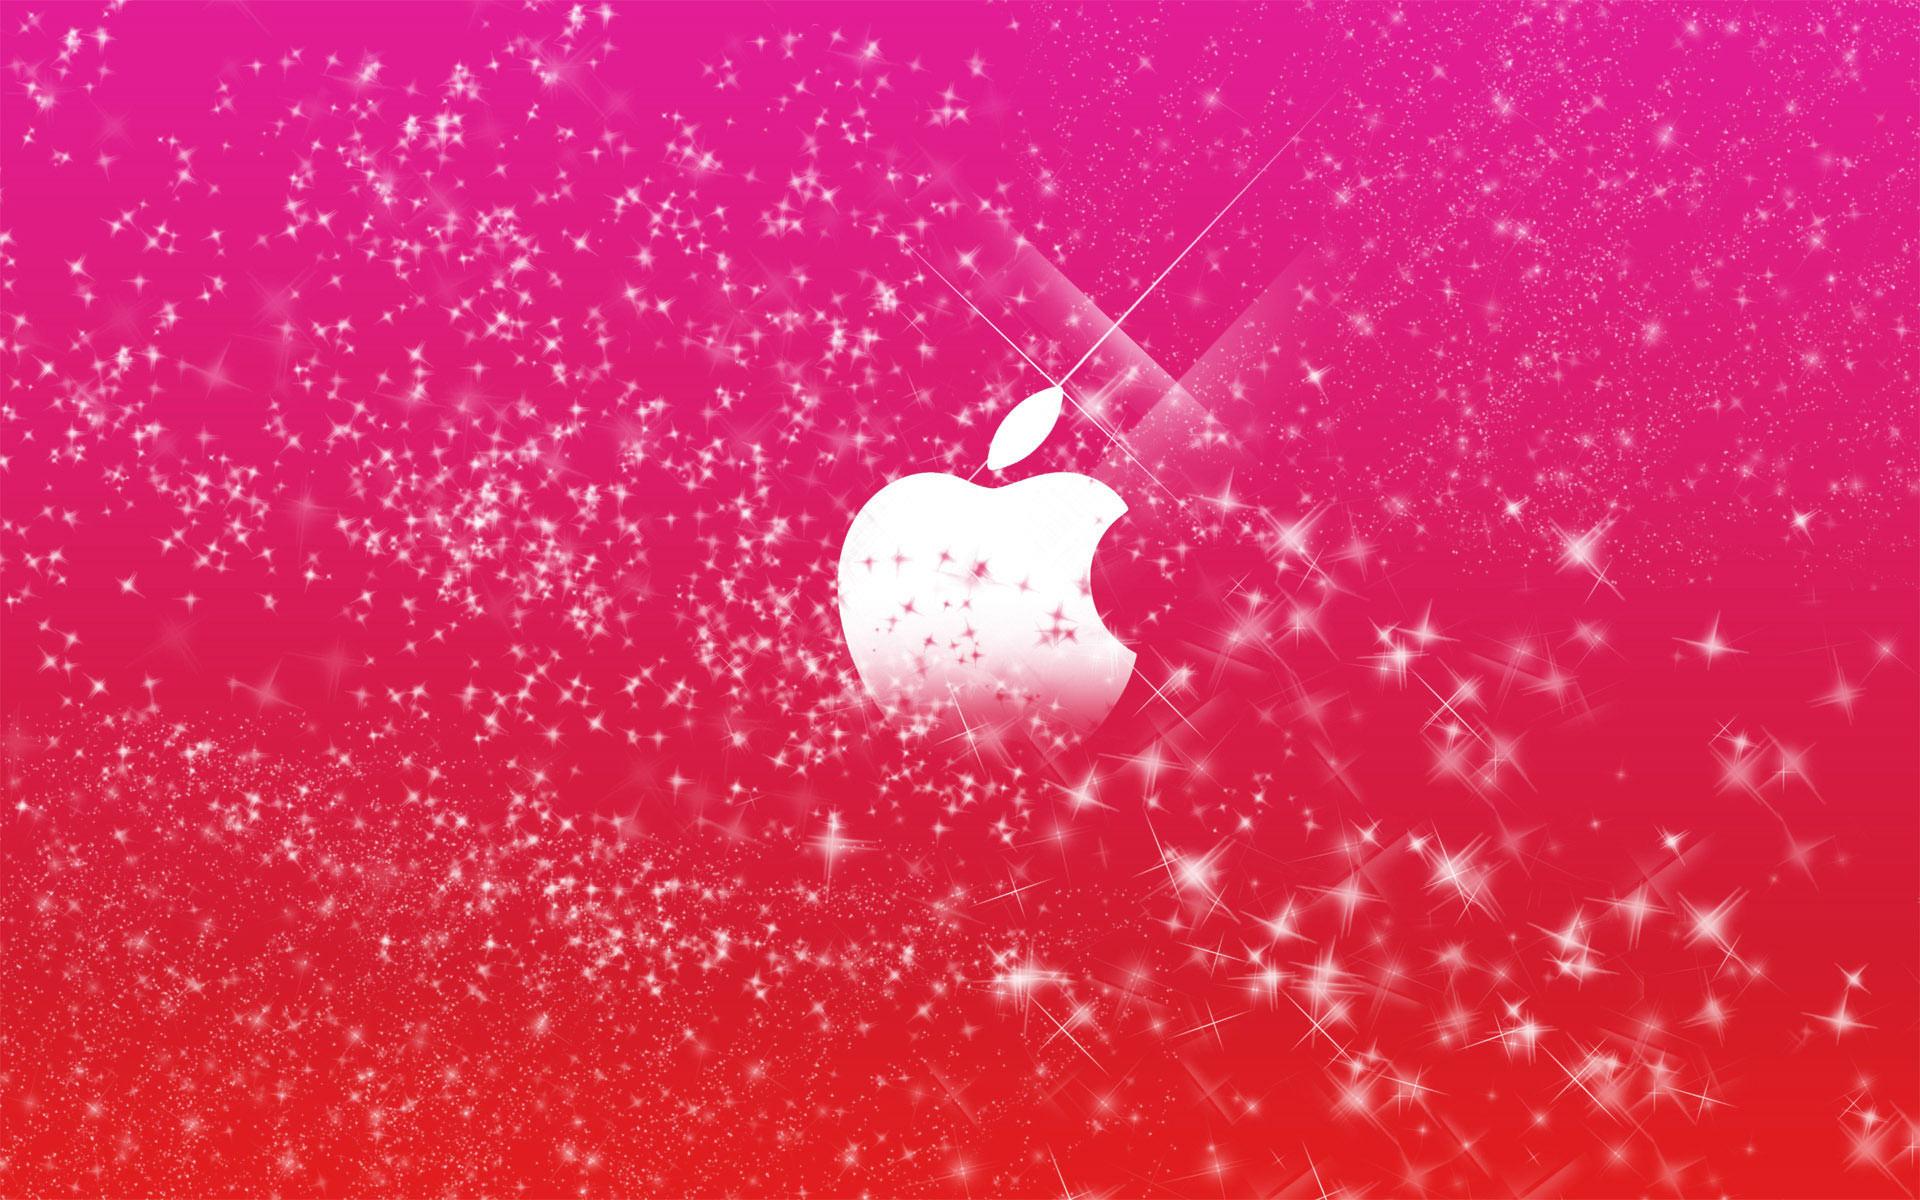 pink desktop backgrounds | pink desktop backgrounds free | Desktop .